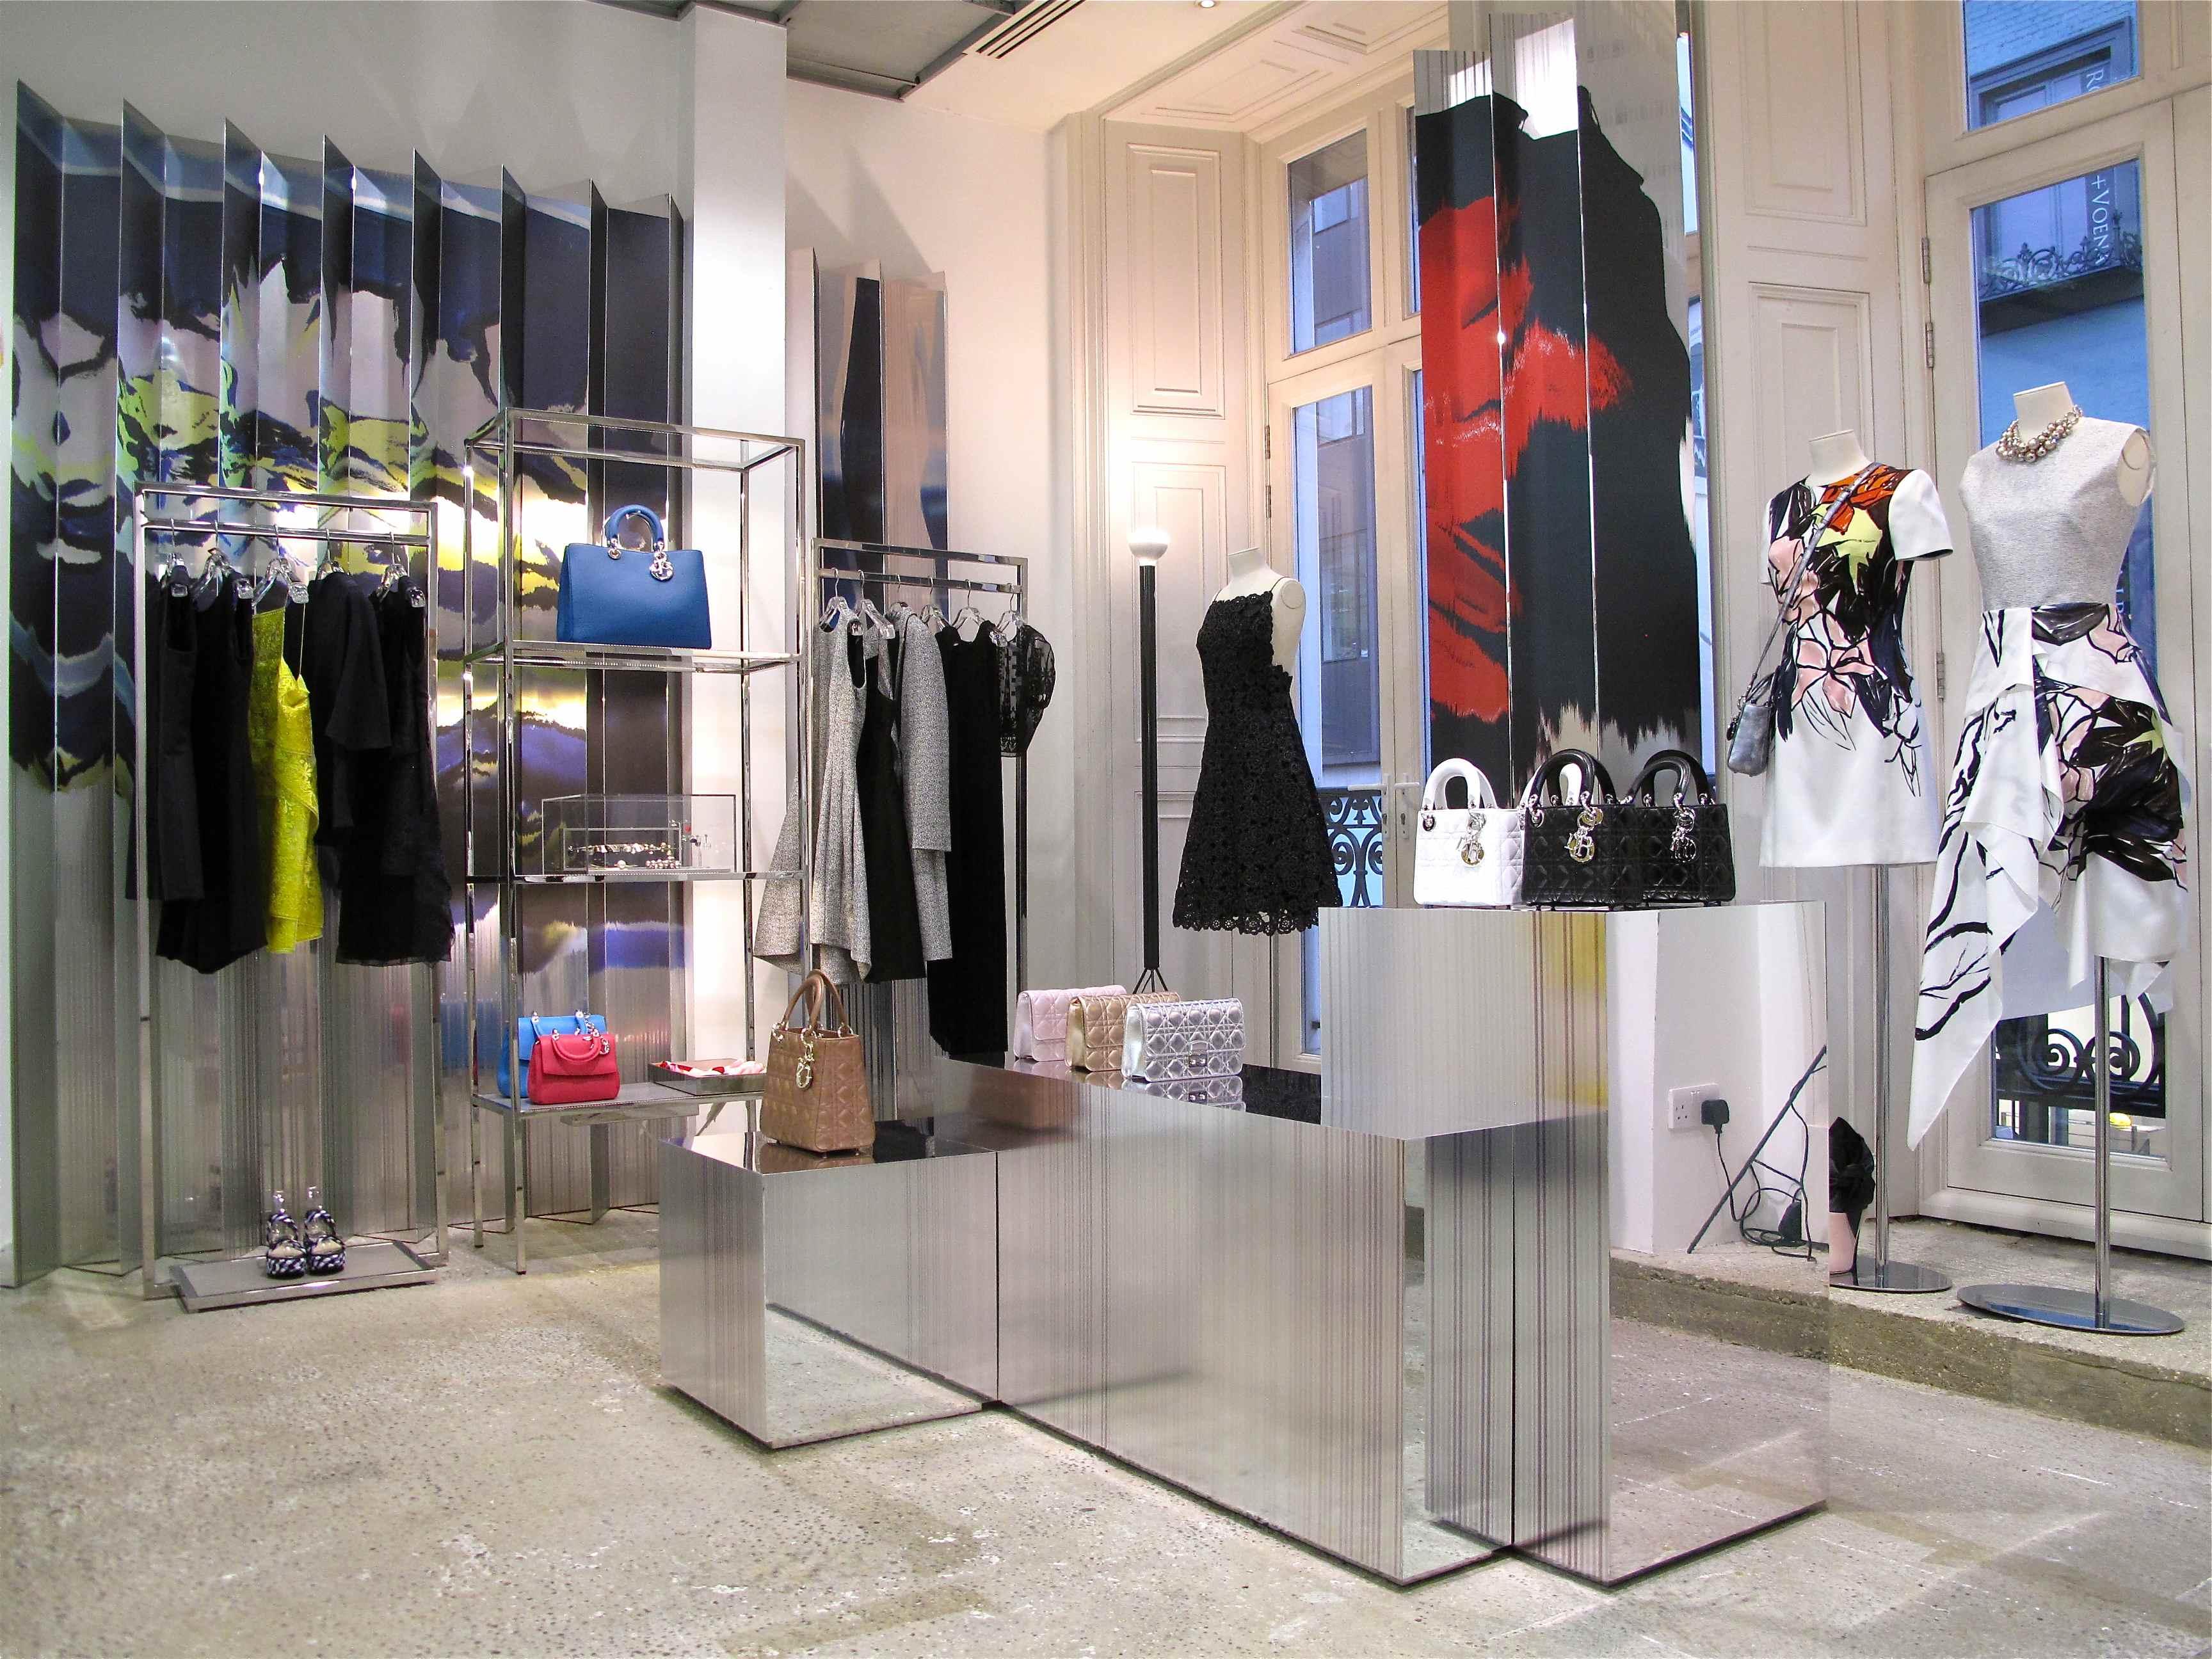 Where Dior Meets Comme des Garçons - Achtung